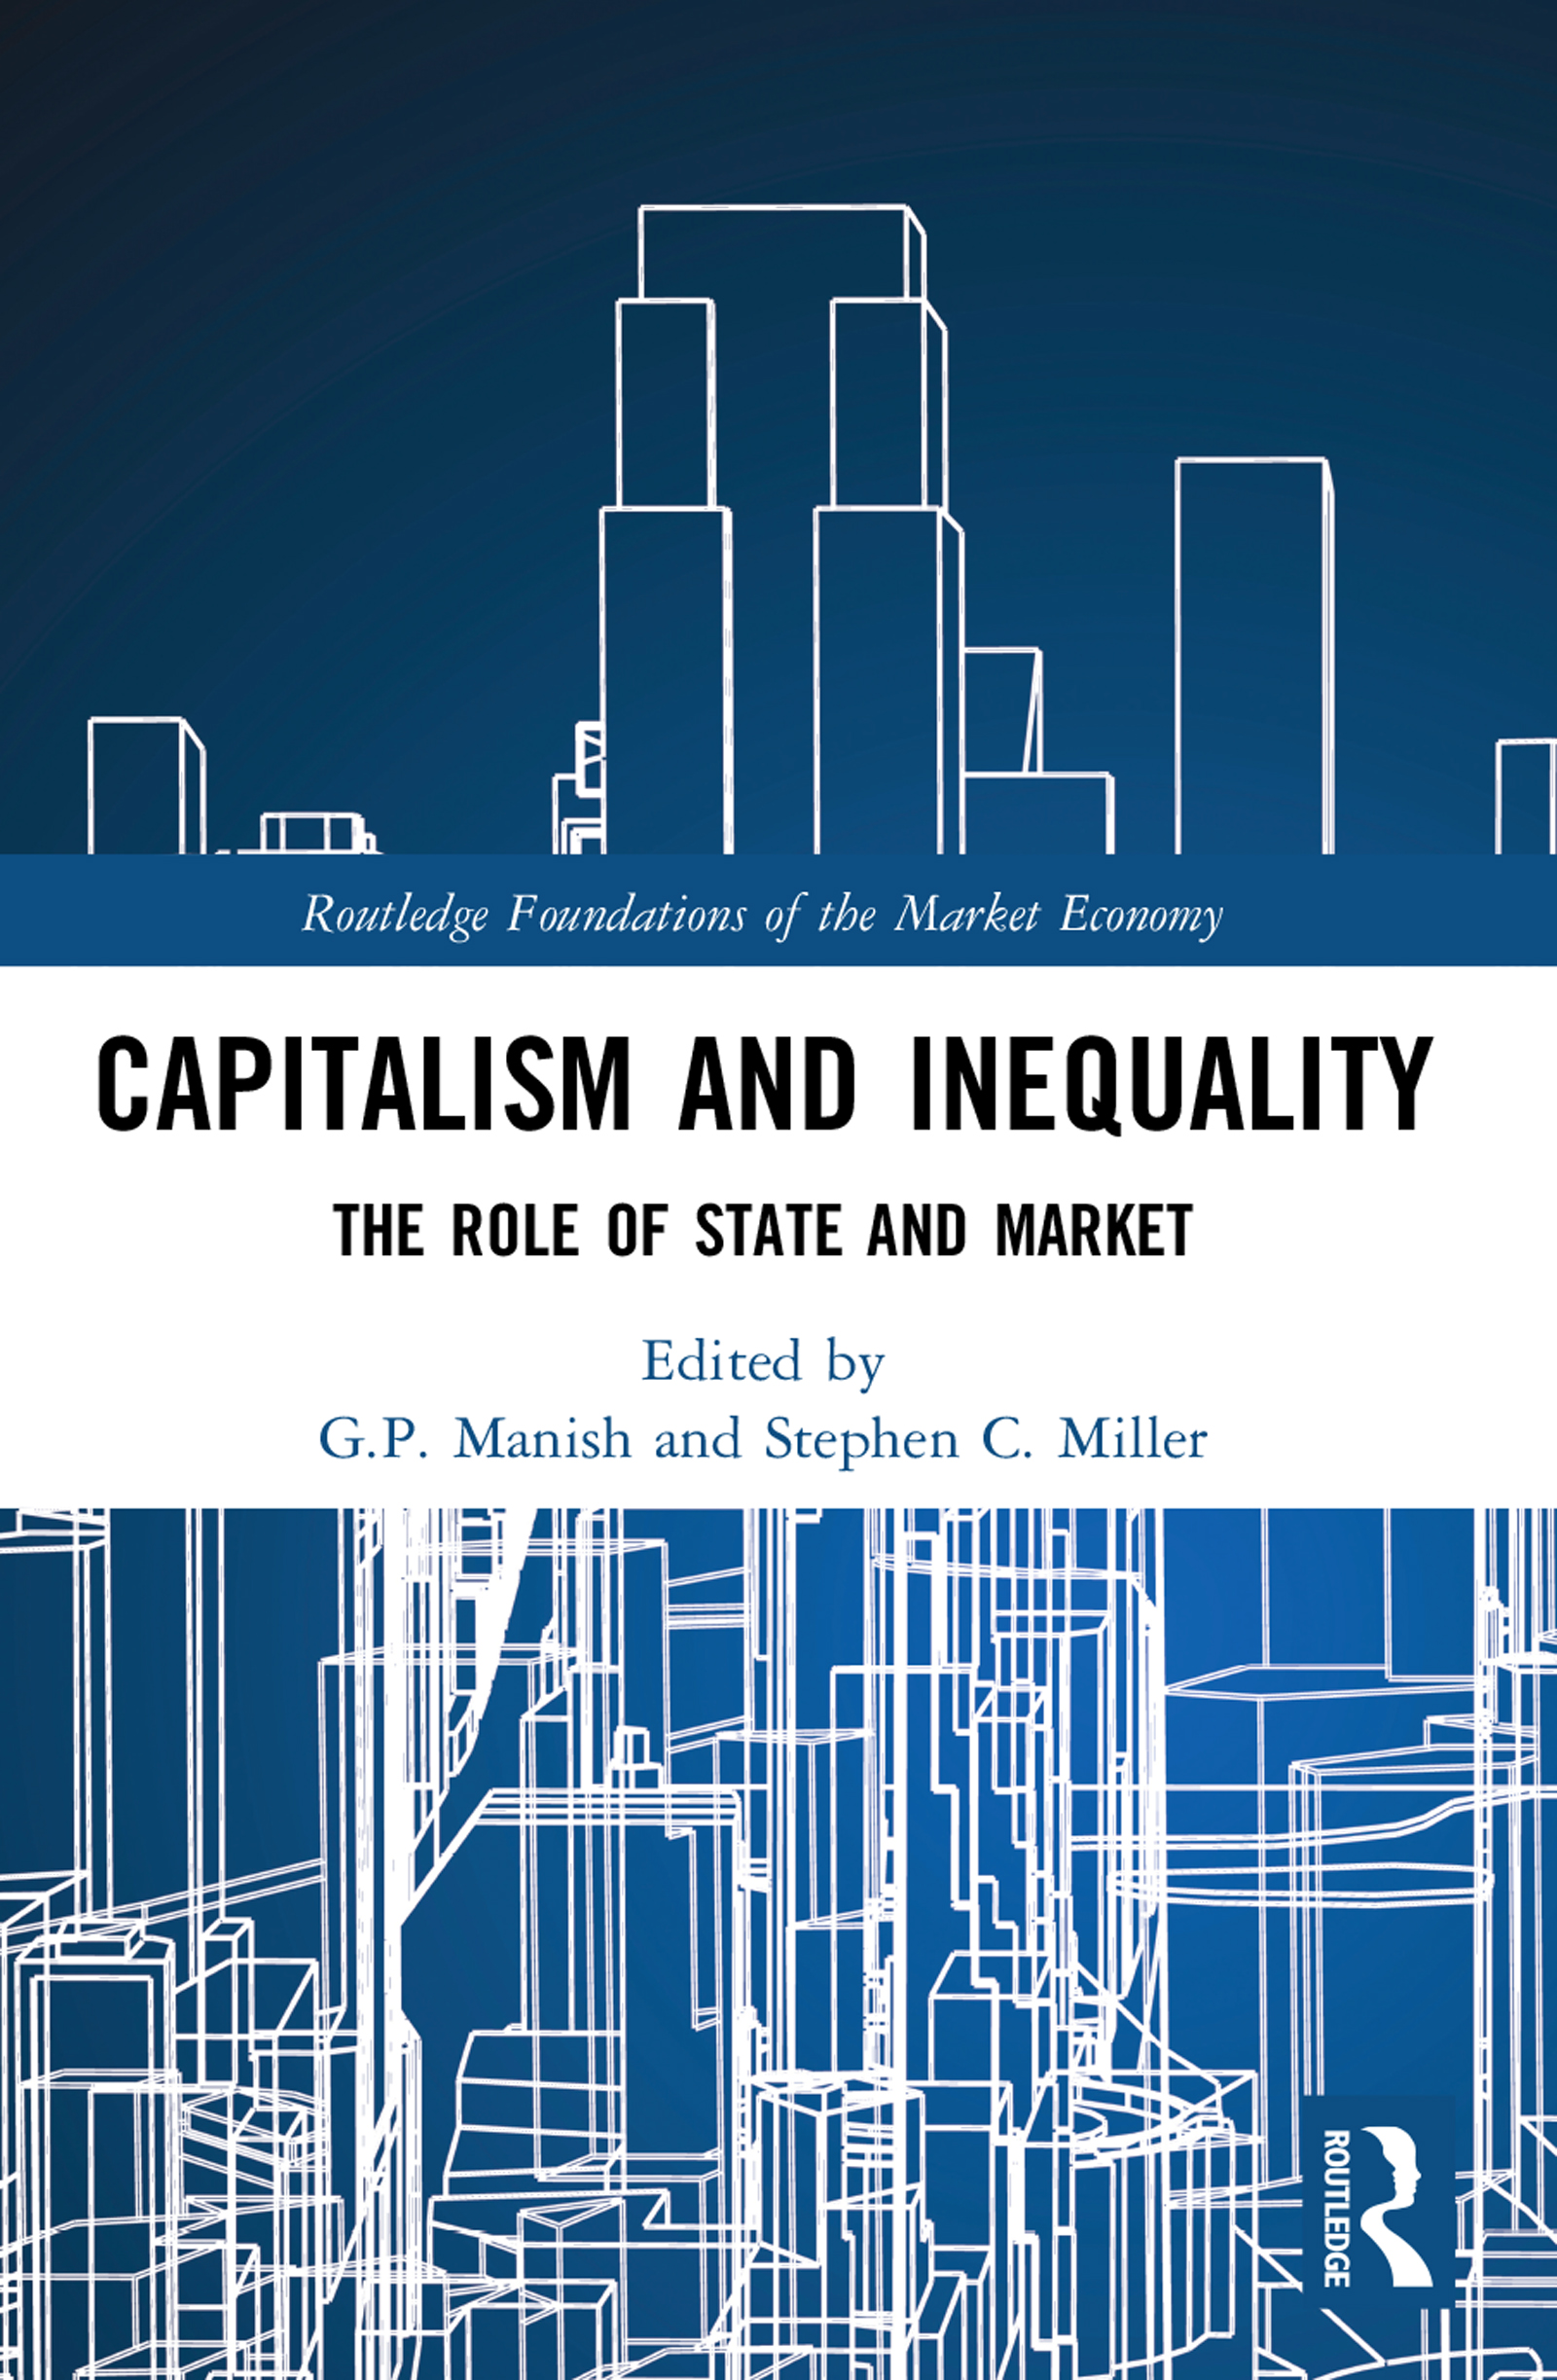 Capitalism, cronyism, and inequality